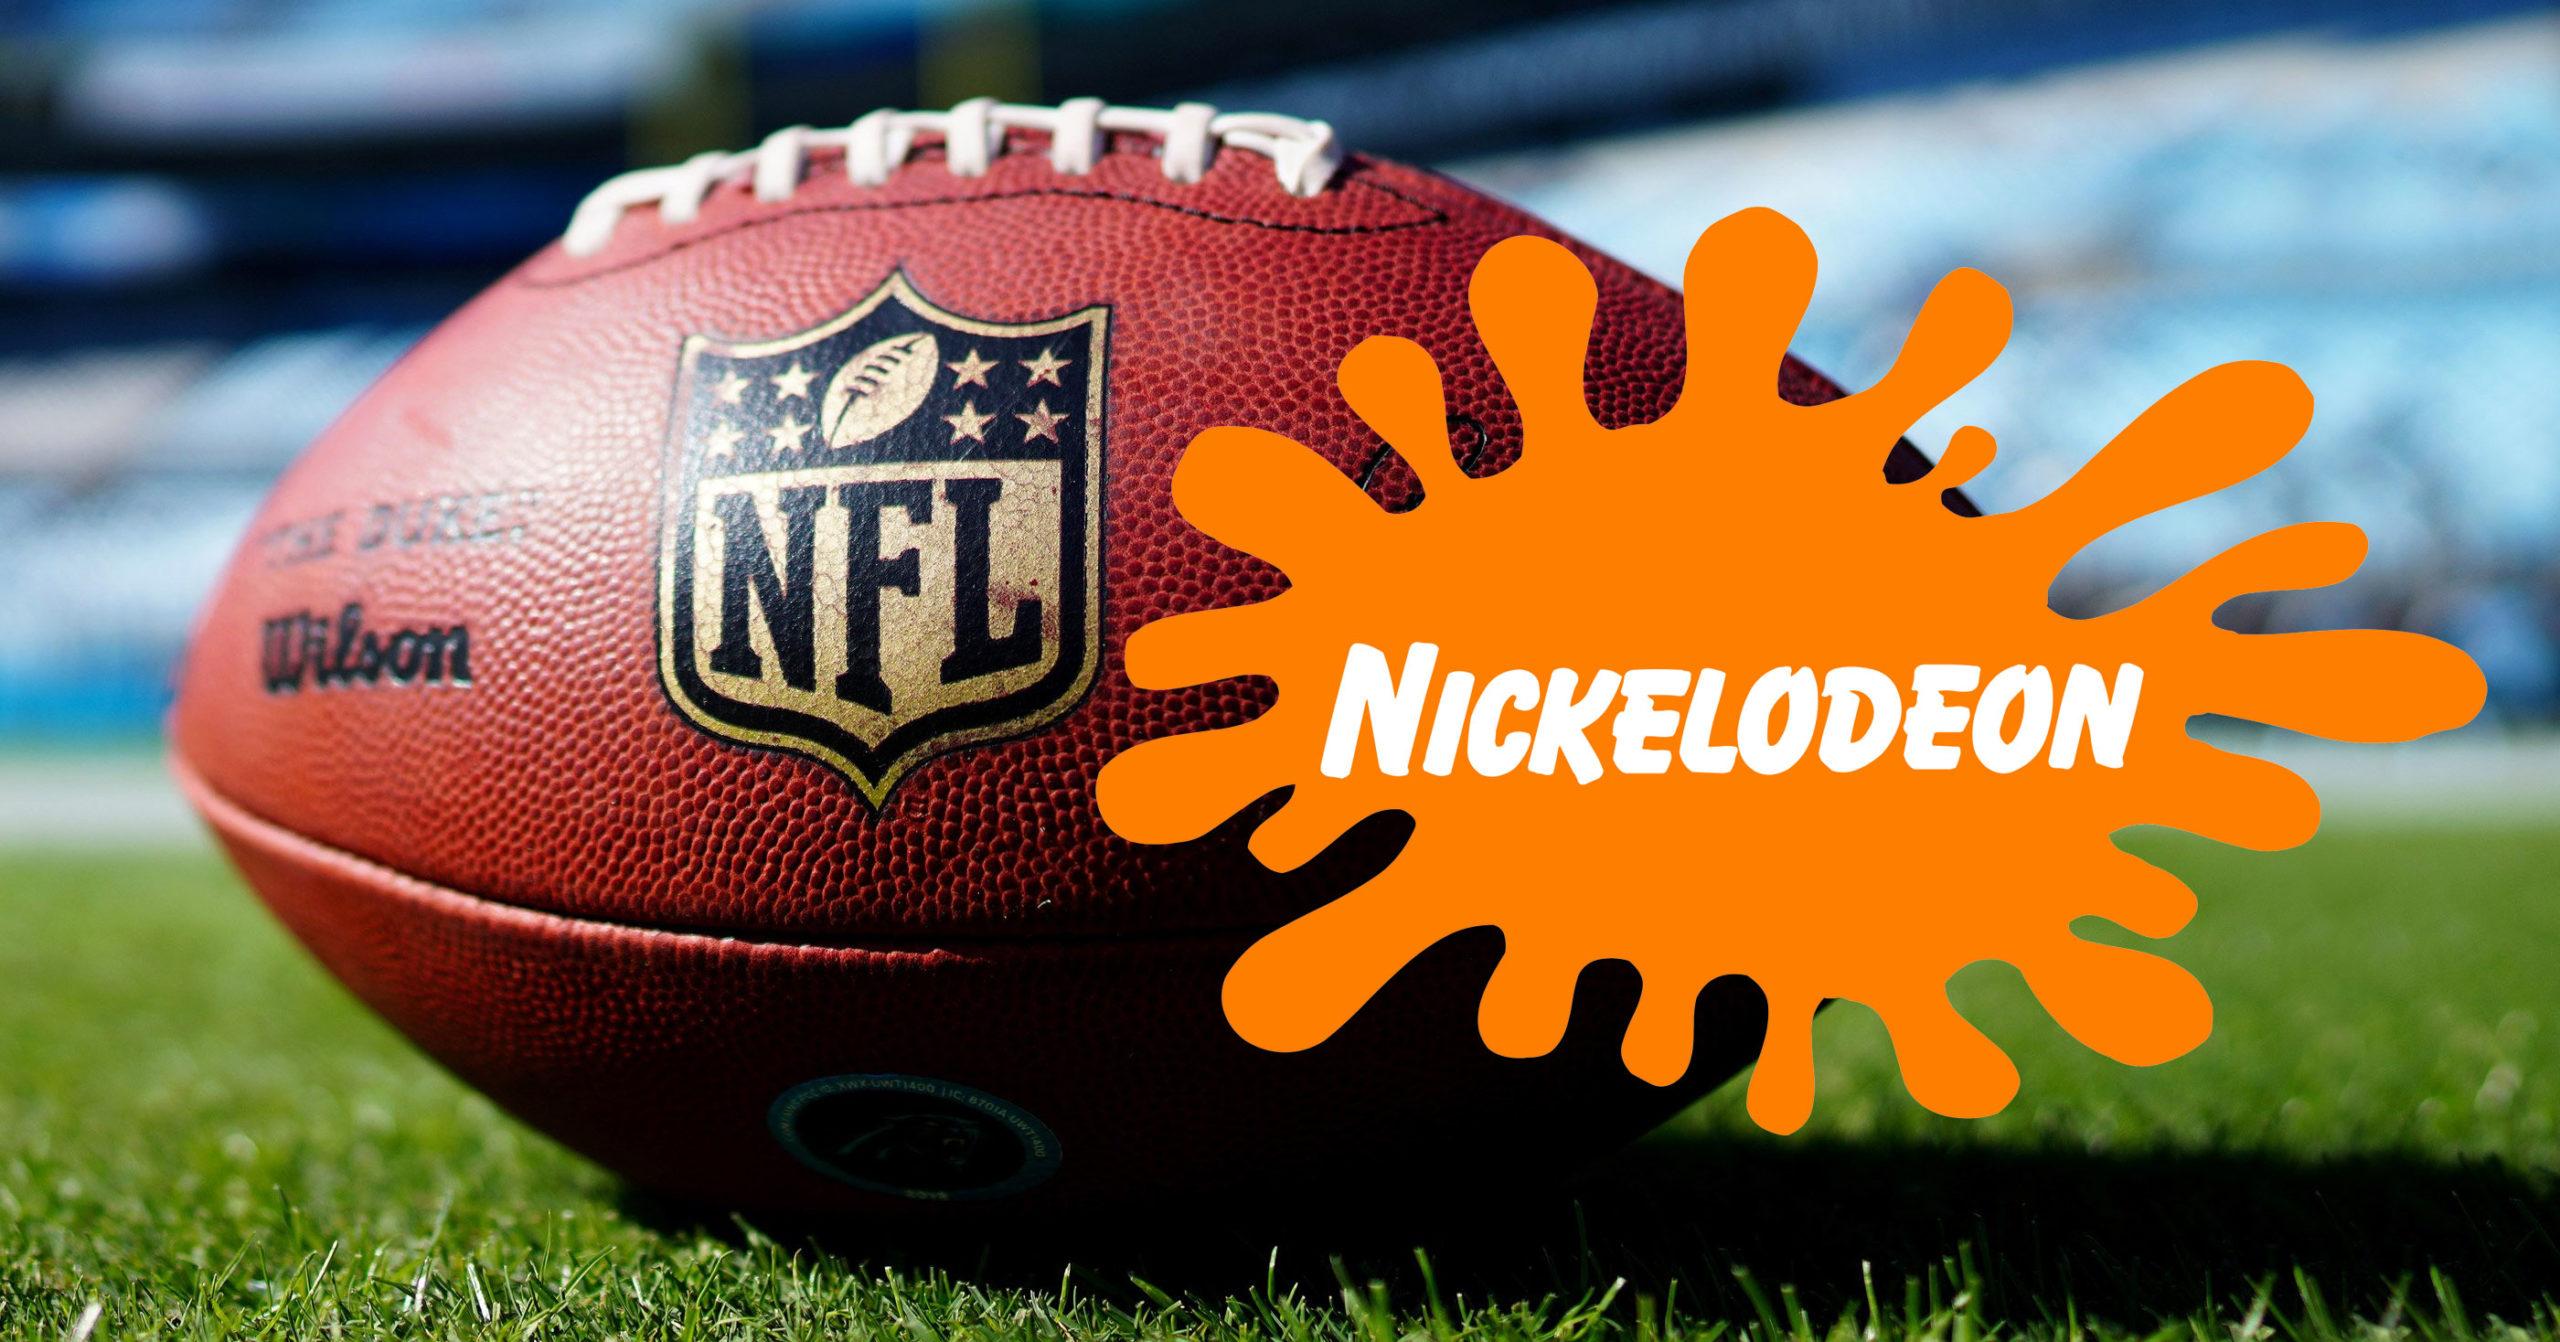 Nickelodeon NFL broadcast poster